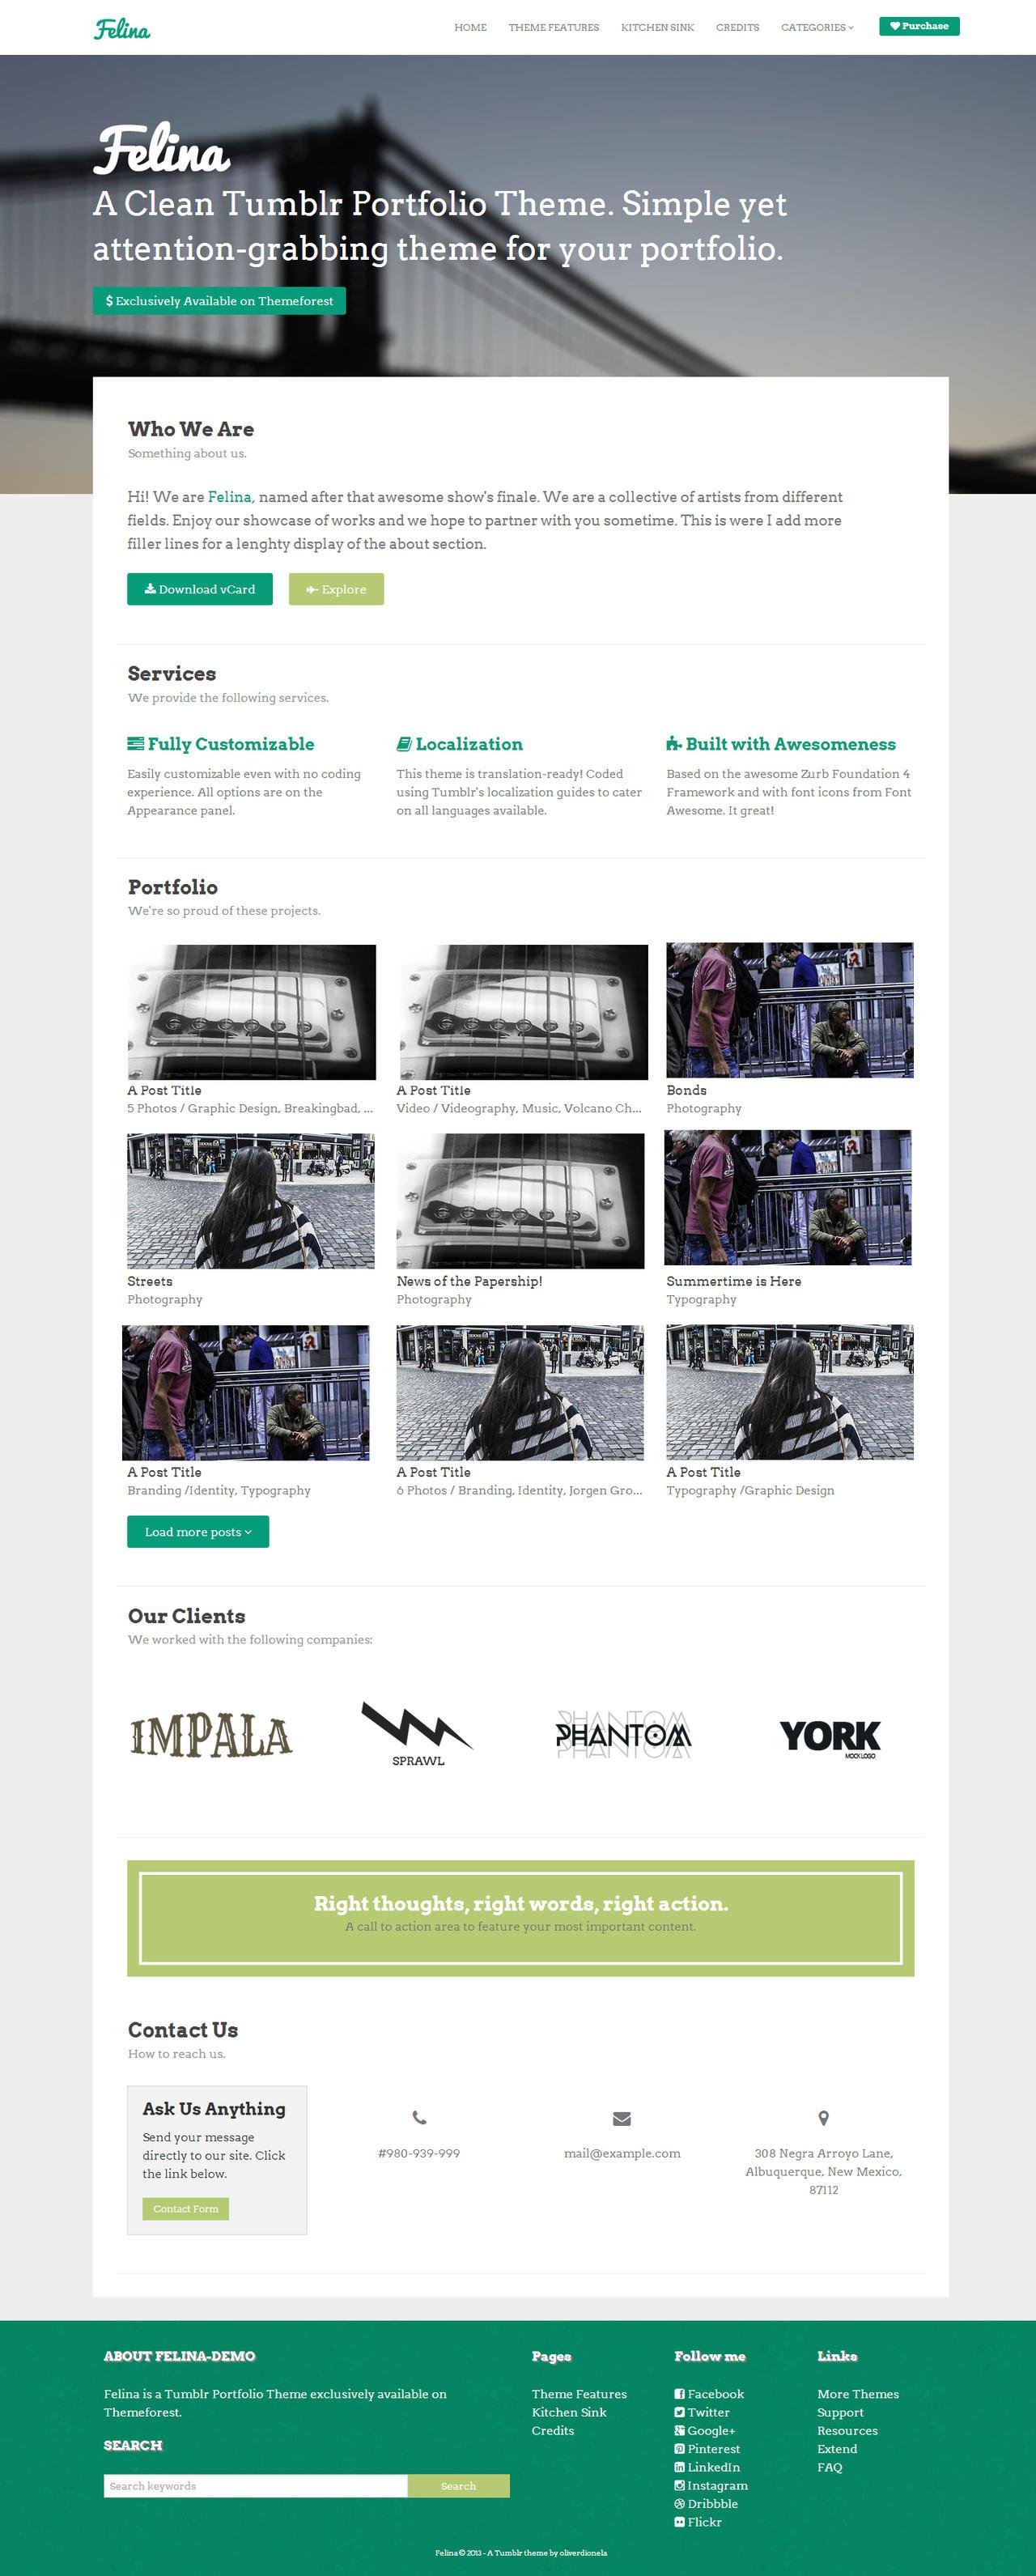 Felina Tumblr Portfolio Theme by odionela